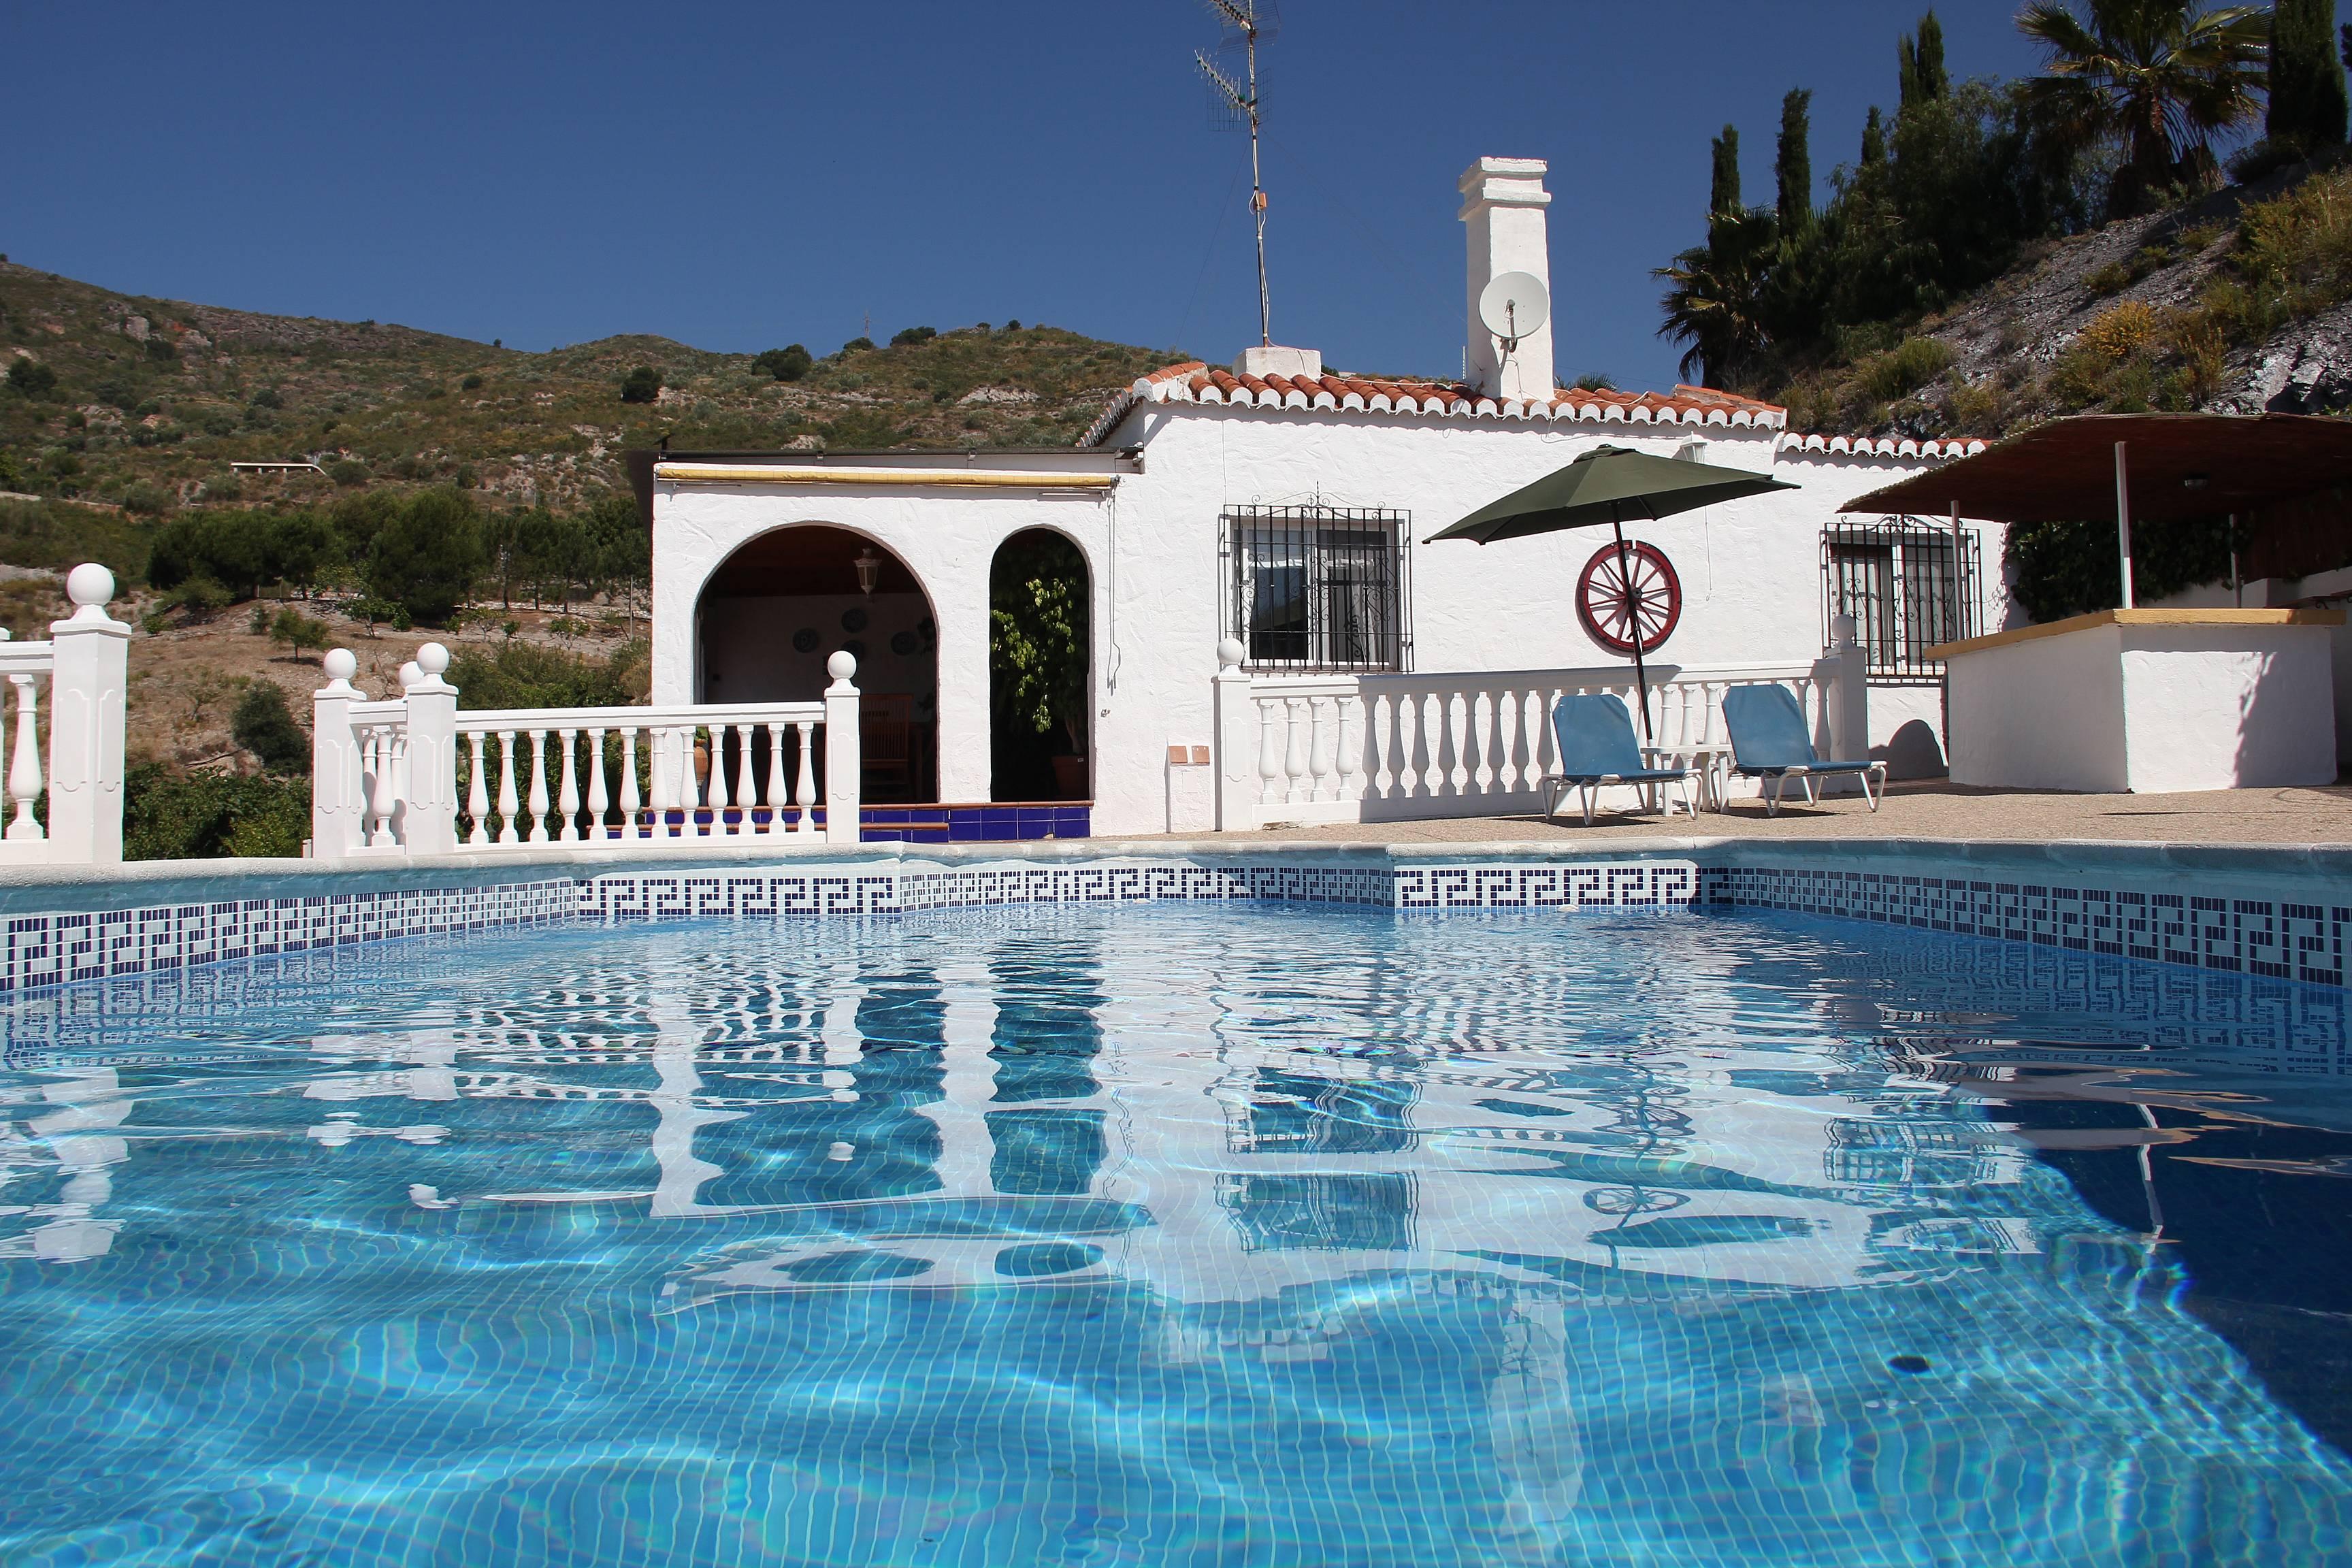 Expl ndida villa en alquiler con piscina privada la for Piscina publica alhendin granada